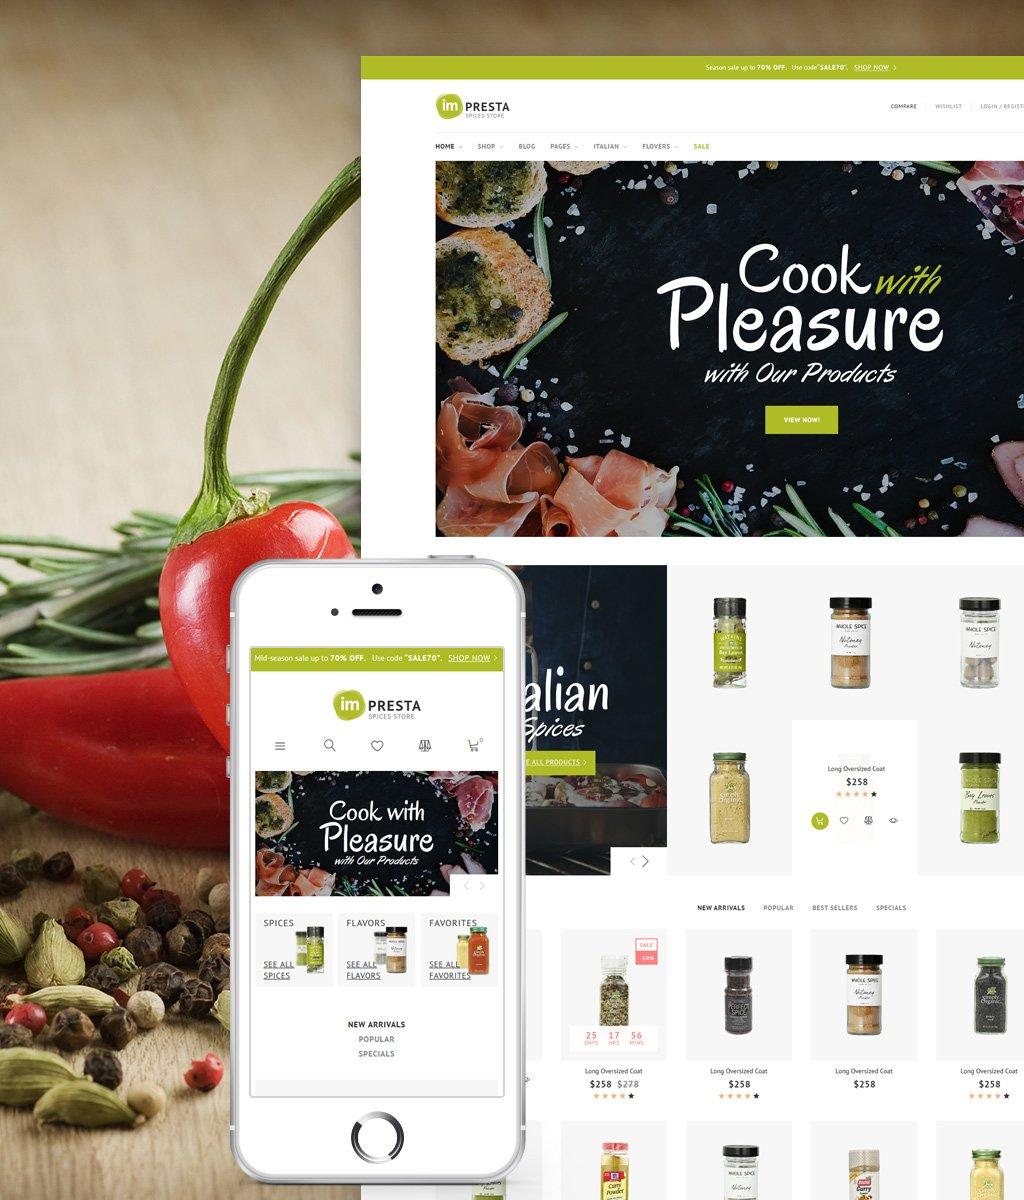 Impresta - Spices Store PrestaShop Theme